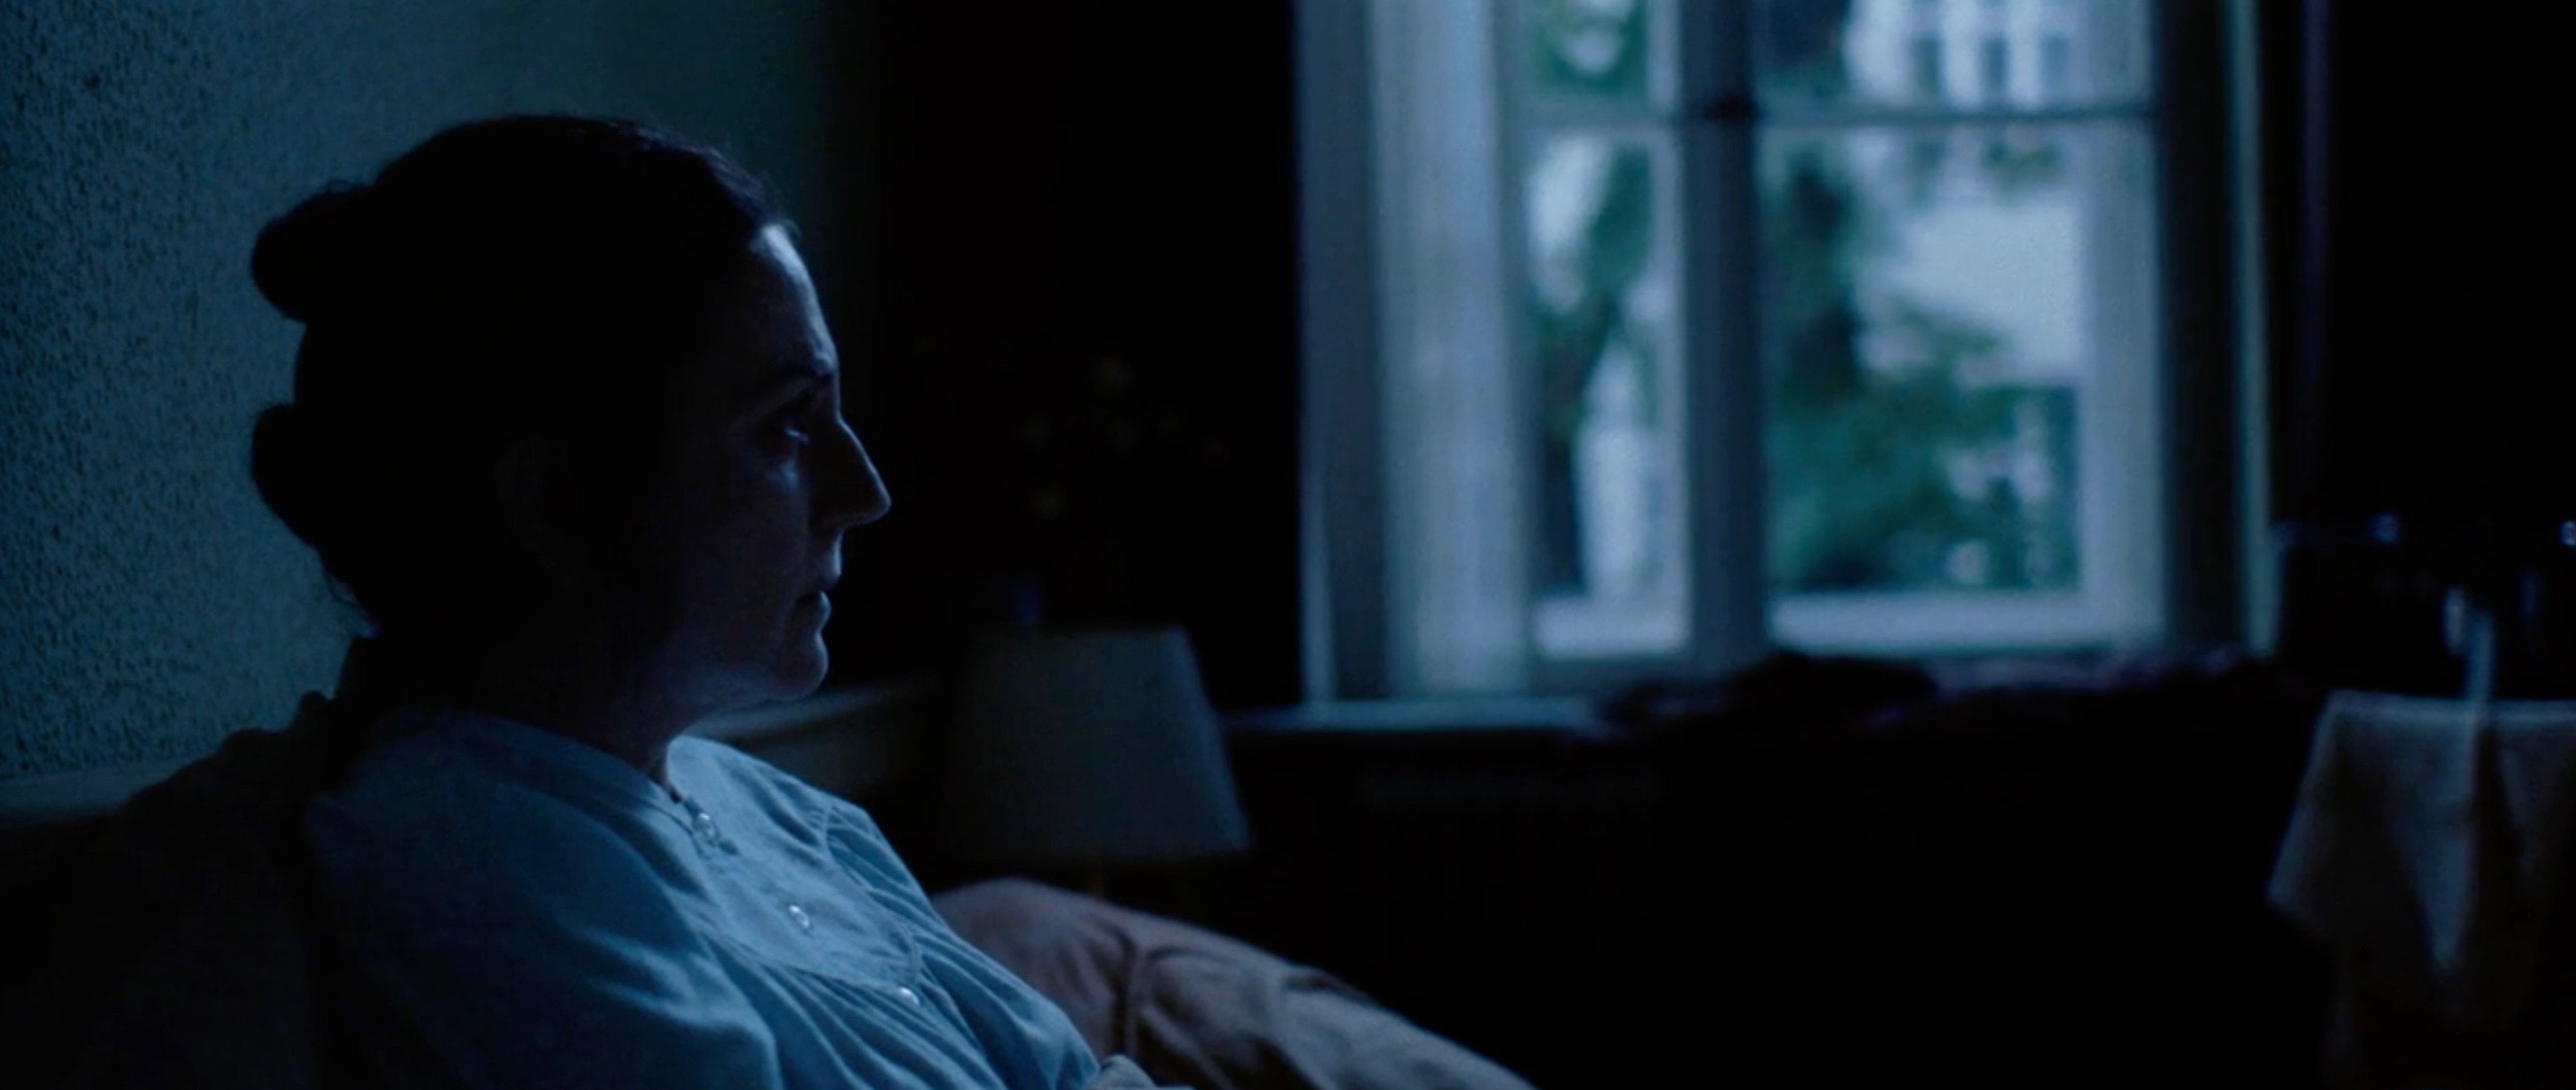 Die Fremde - Derya Alabora spielt Umays Mutter Halime - Regie: Feo Aladag - Kamera Judith Kaufmann